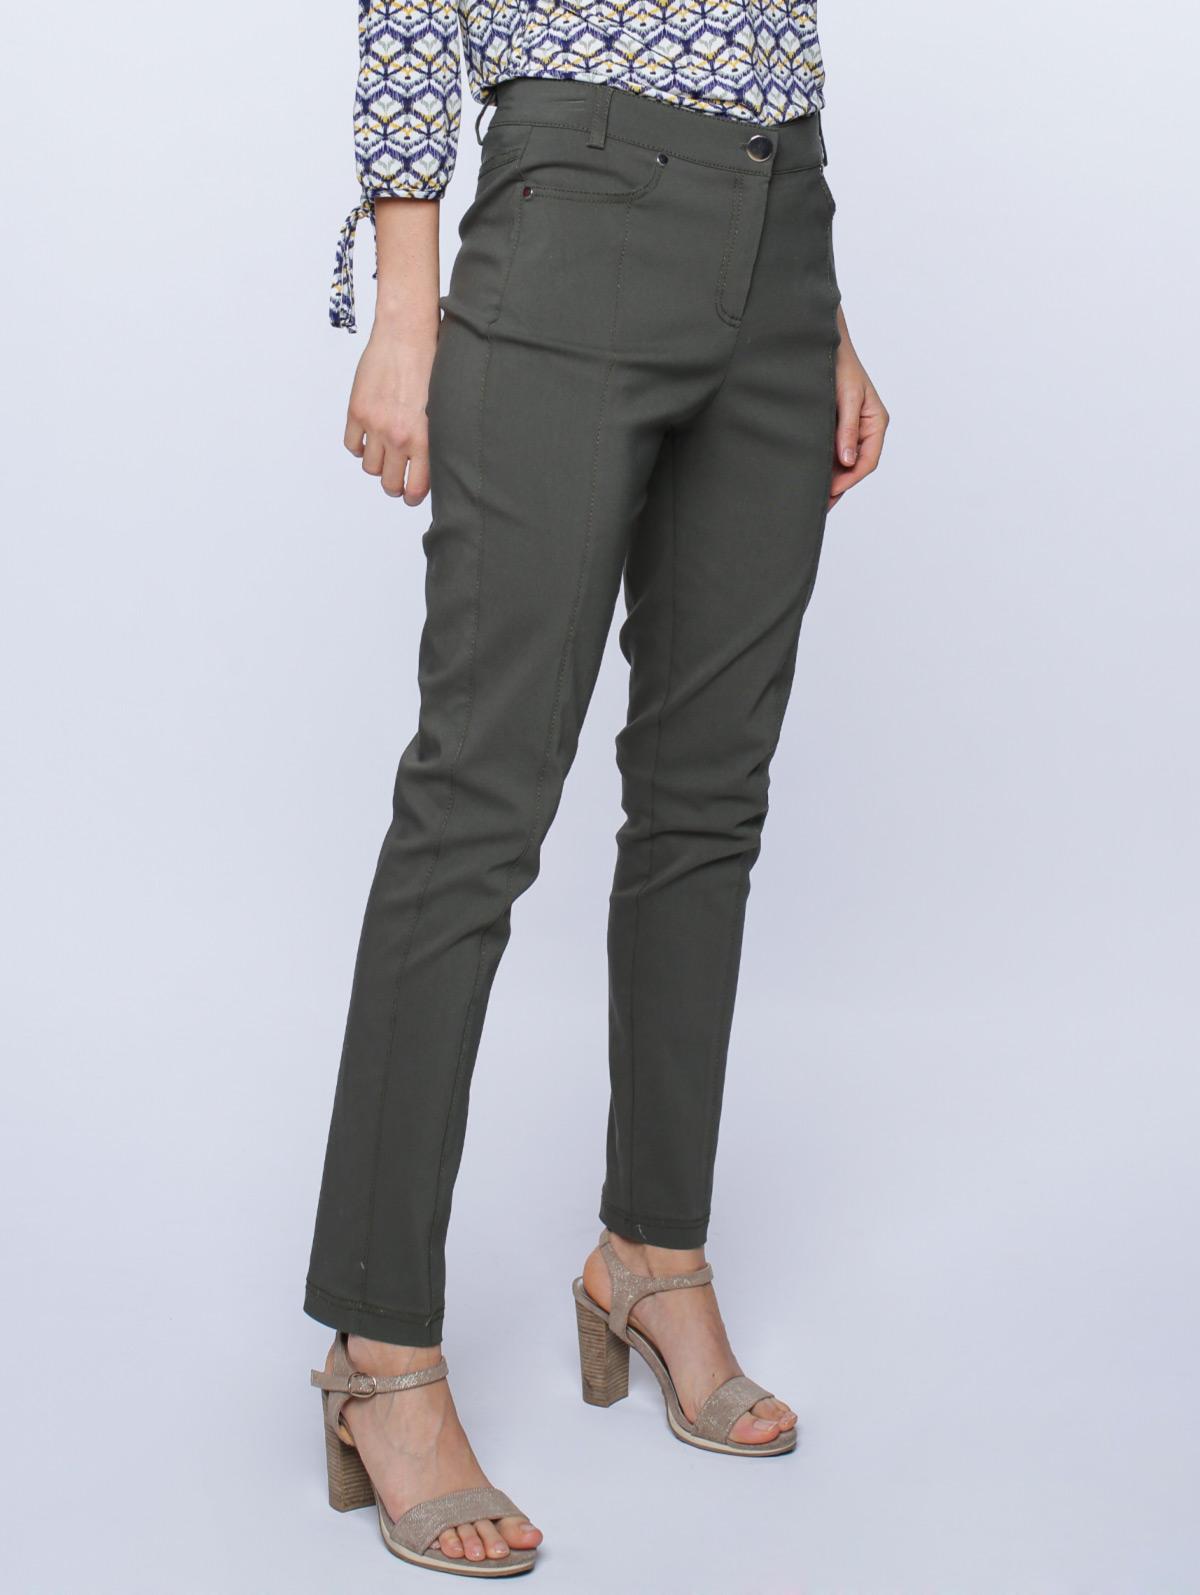 Pantalon bengaline surpiqûre